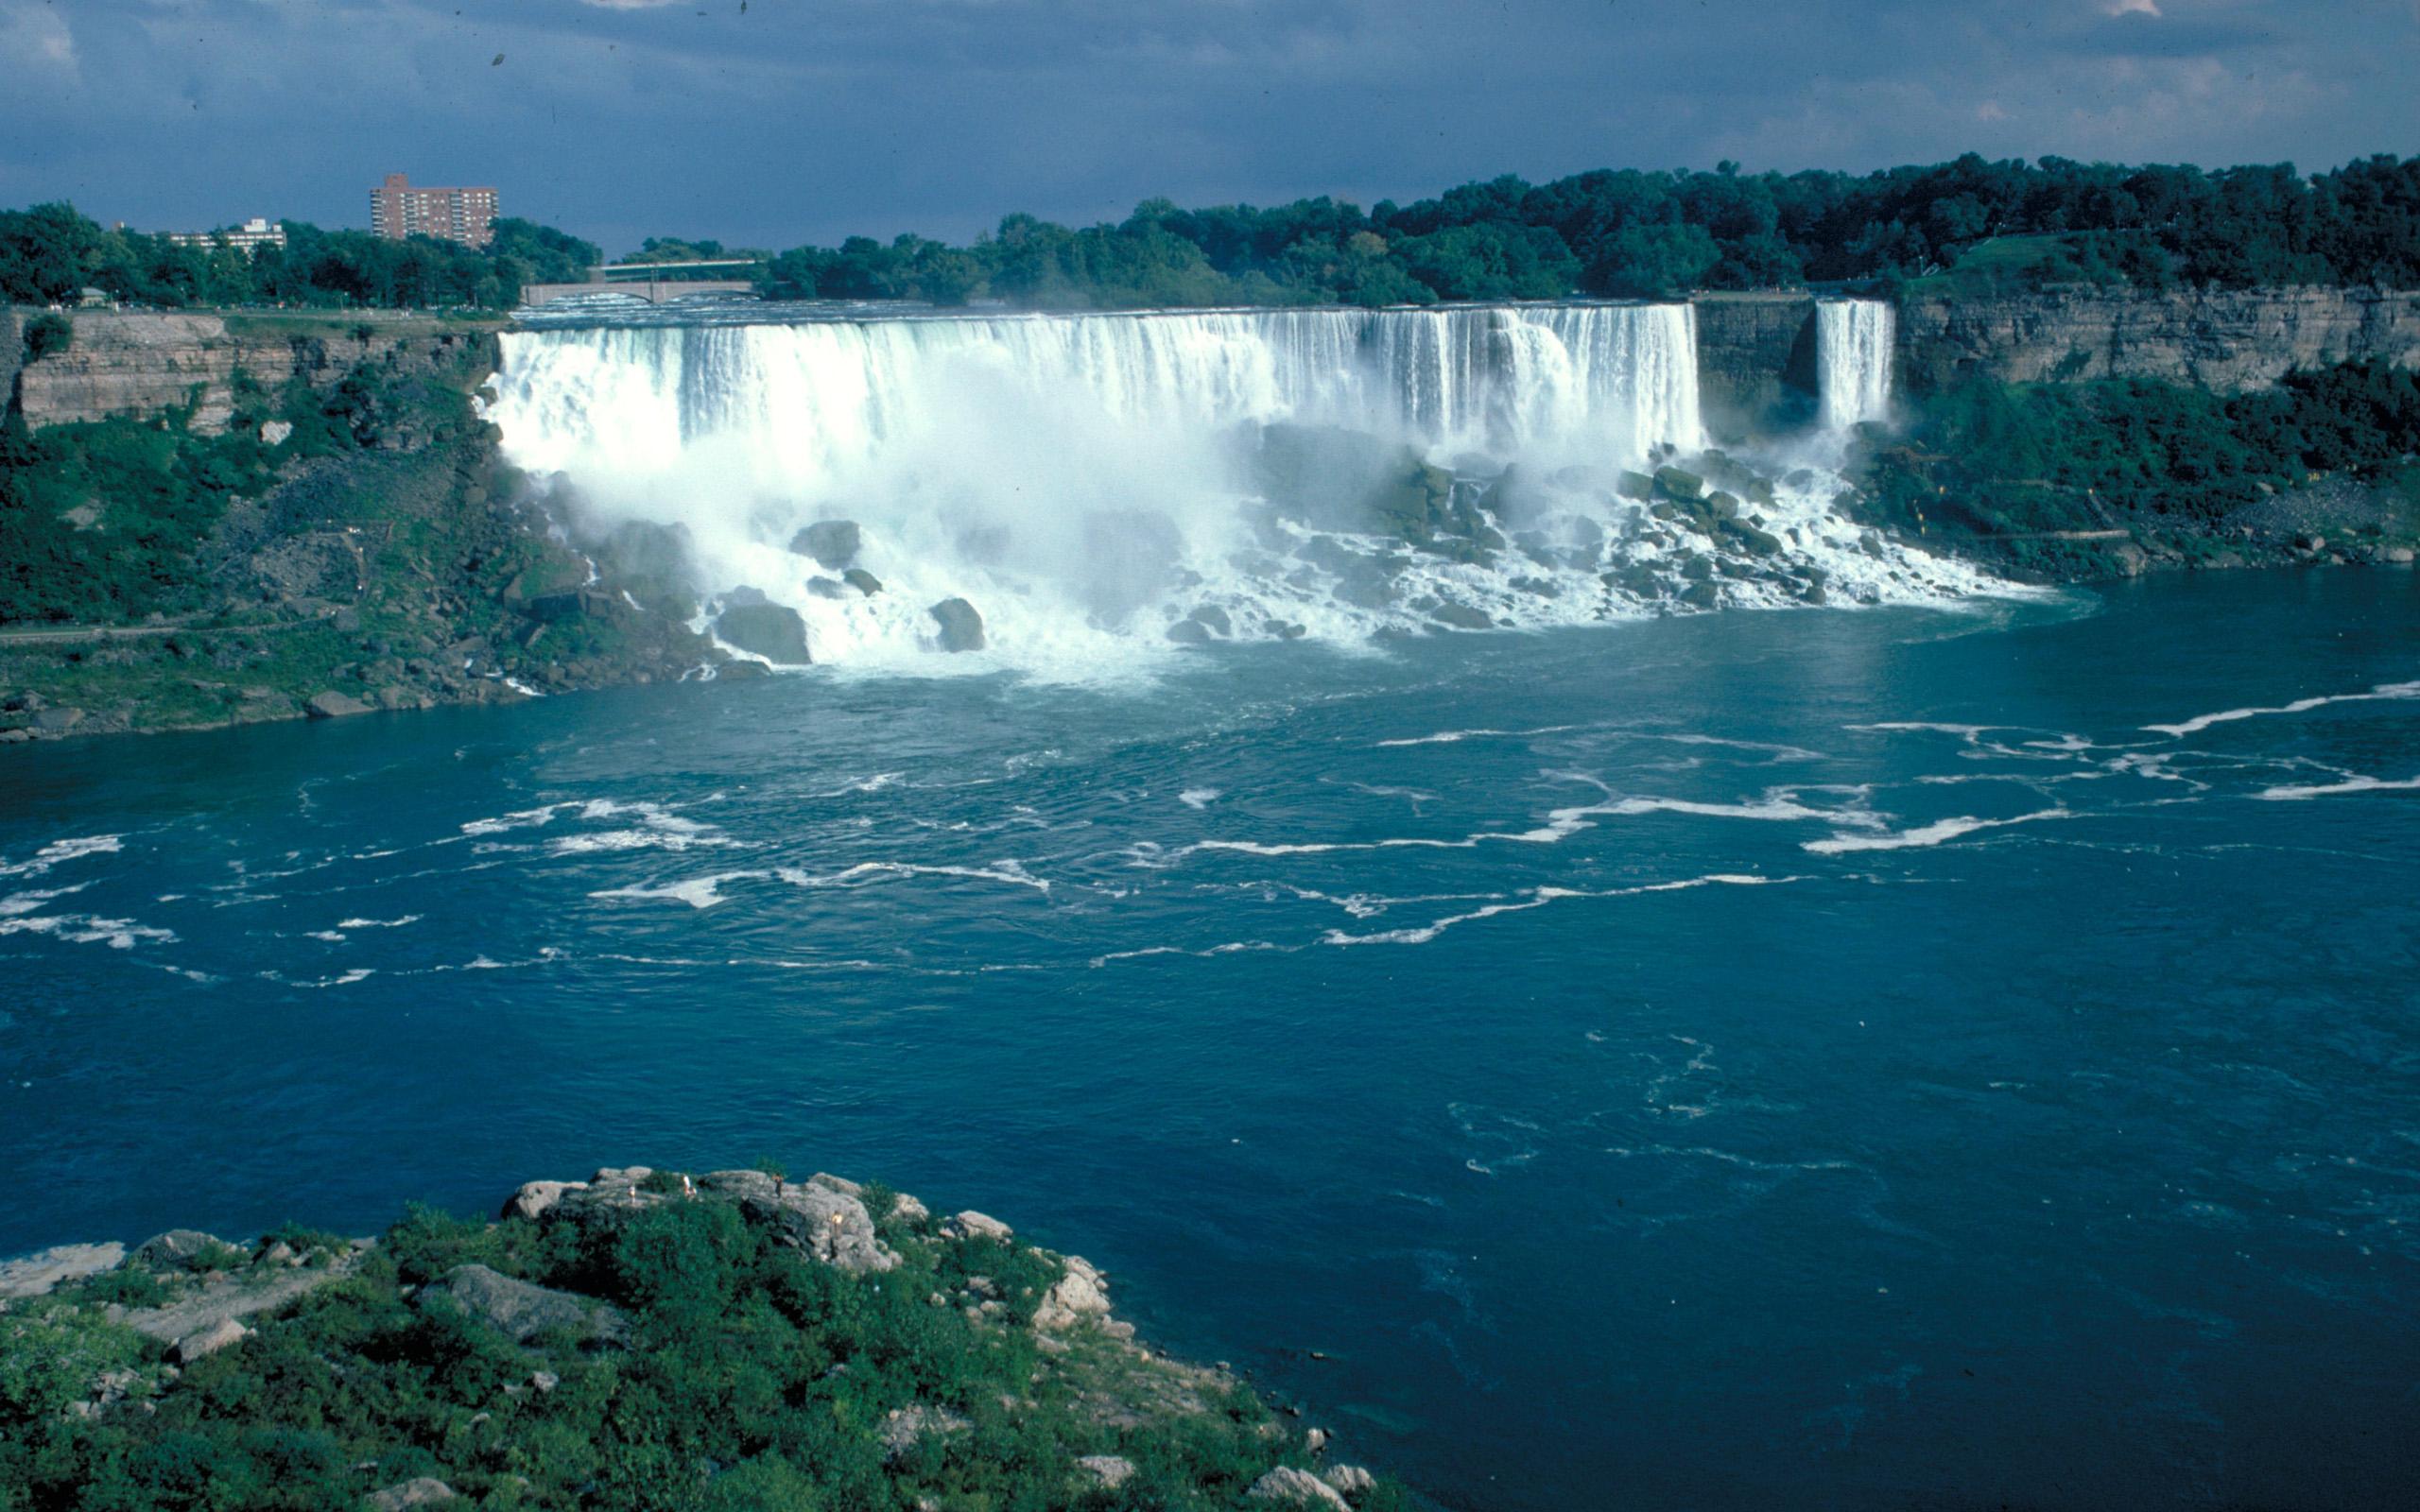 Free Download Niagara Falls Wallpaper For 2560x1600 For